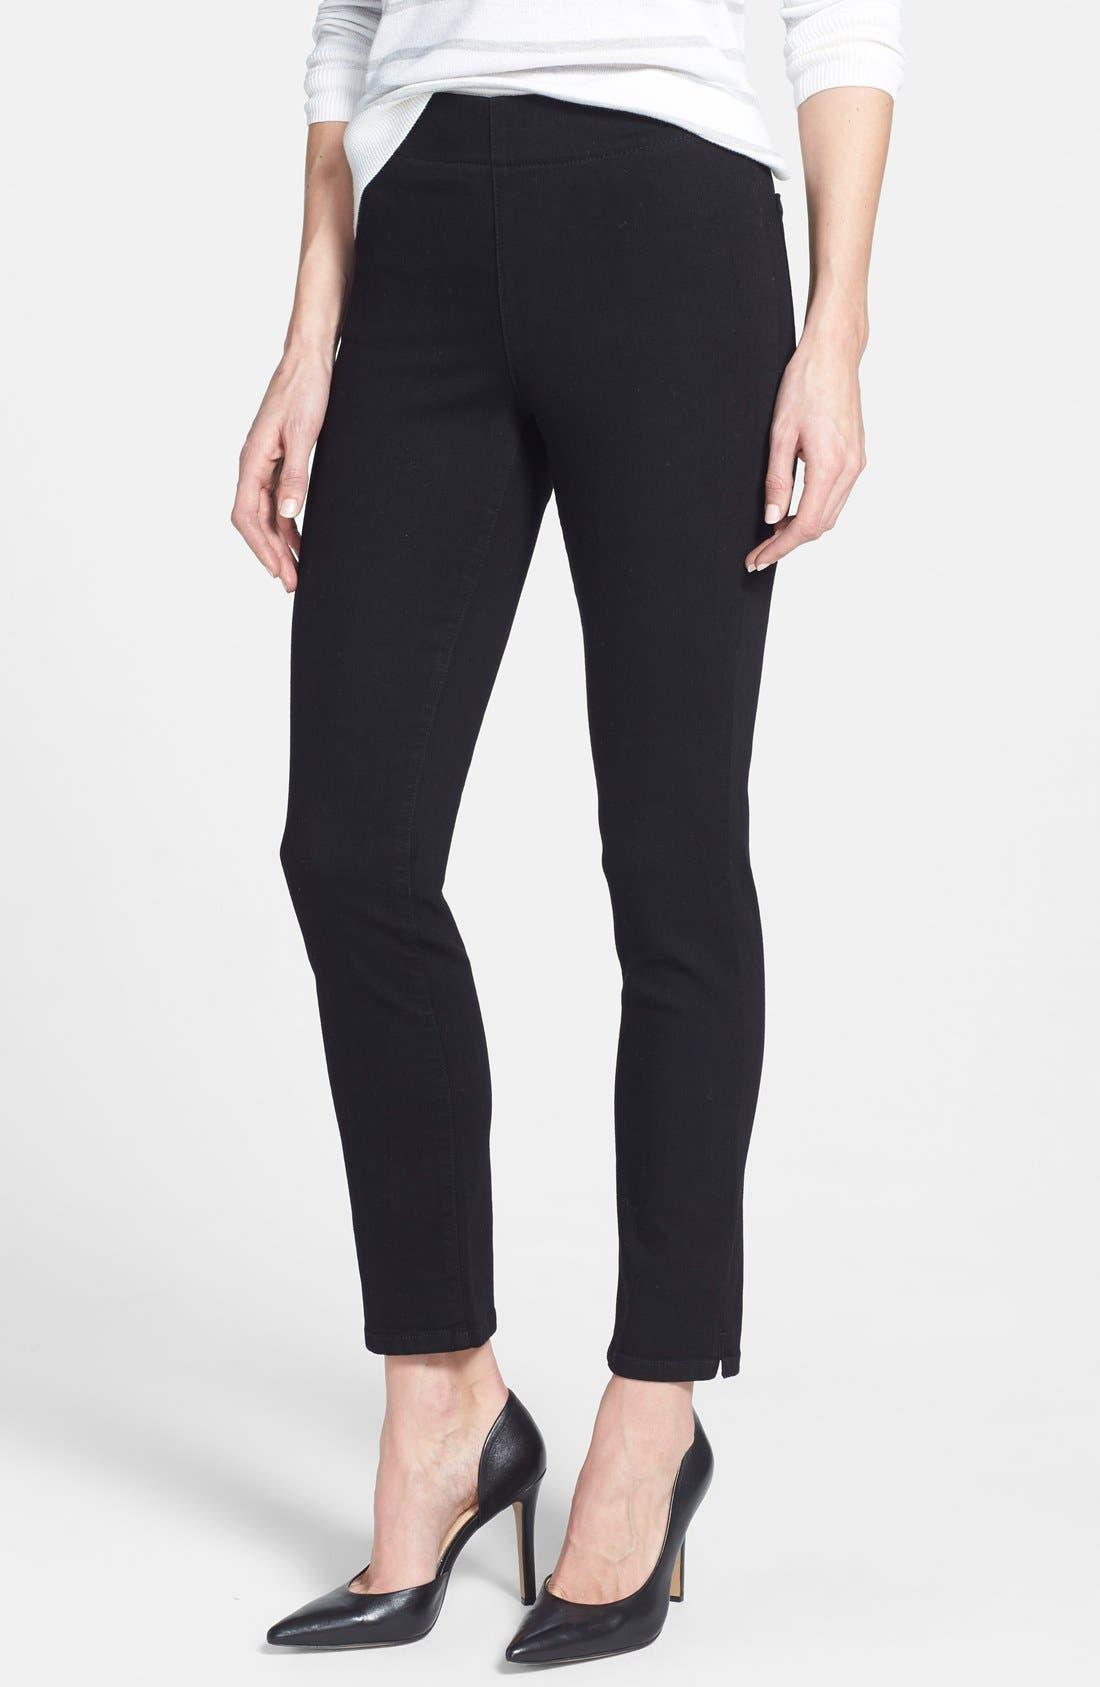 NYDJ Alina Stretch Ankle Jeans (Black) (Regular & Petite)